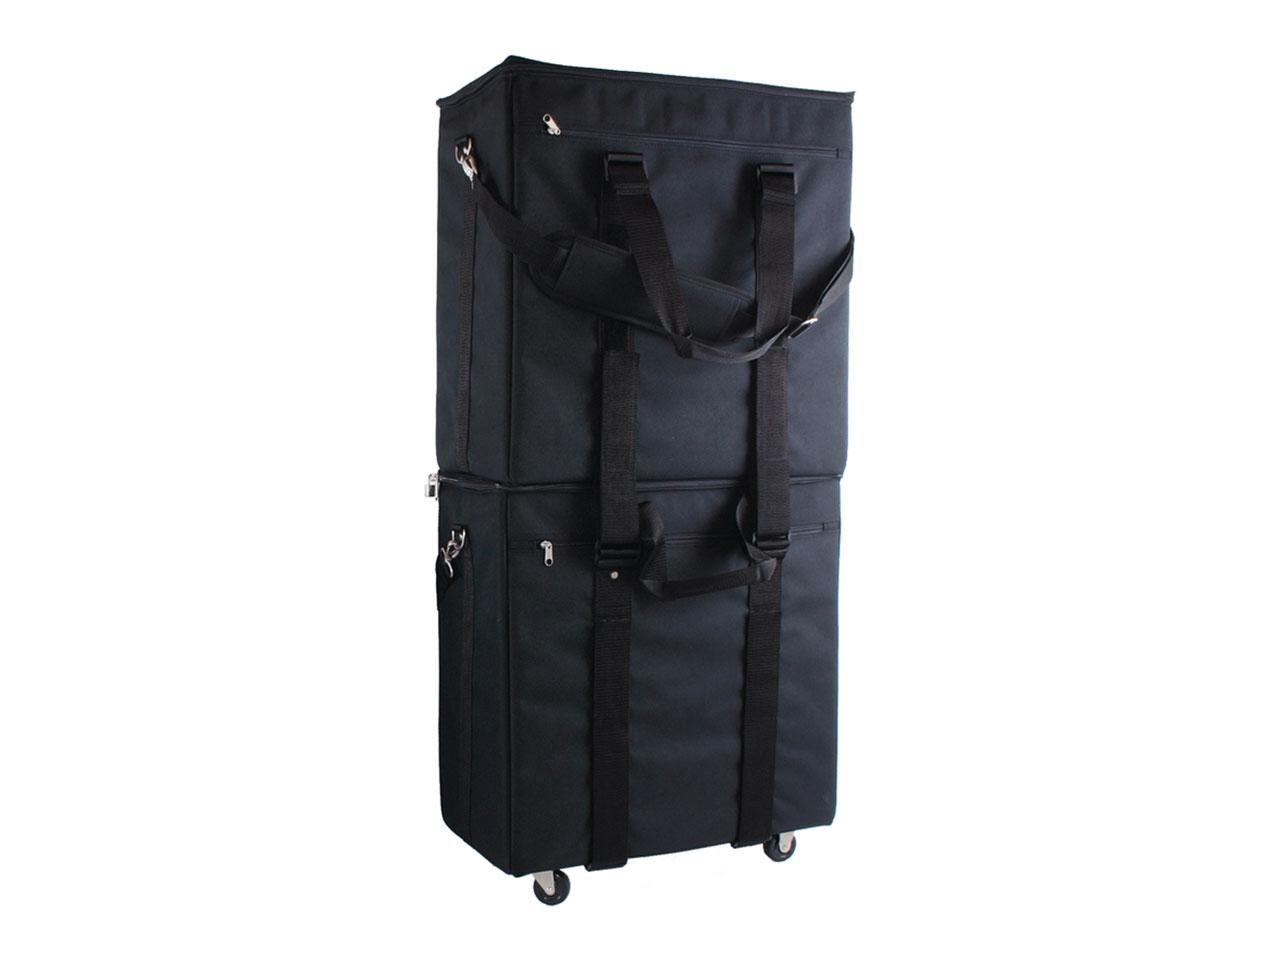 AE-2B-P High Capacity Piggyback Bags